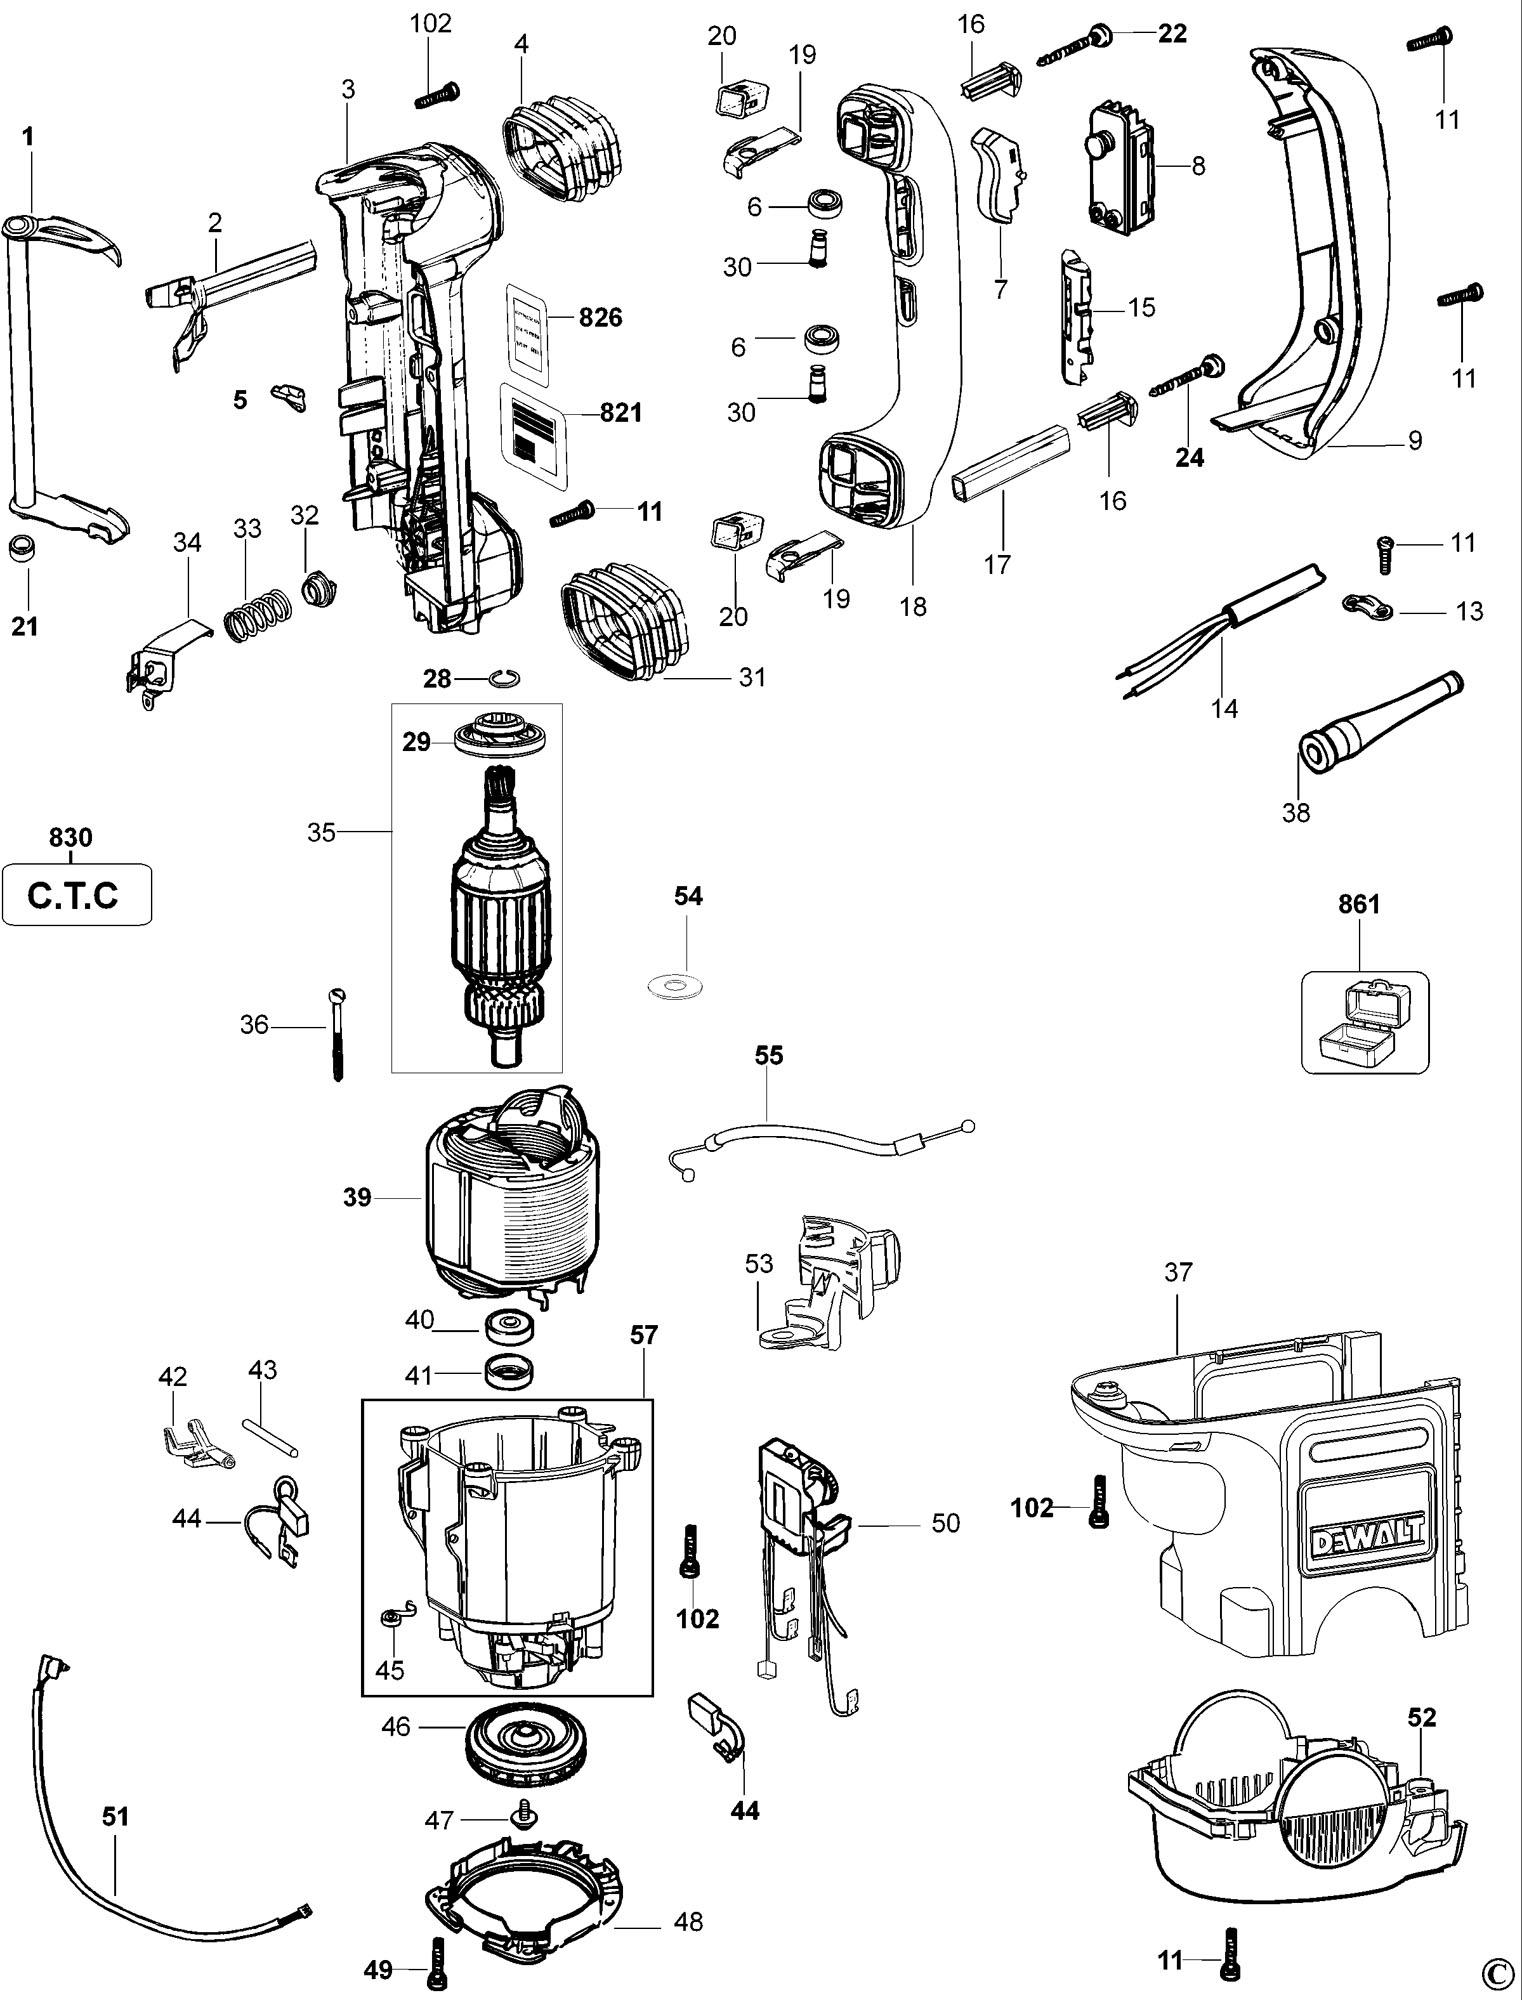 Spares For Dewalt D K Rotary Hammer Type 1 Spare